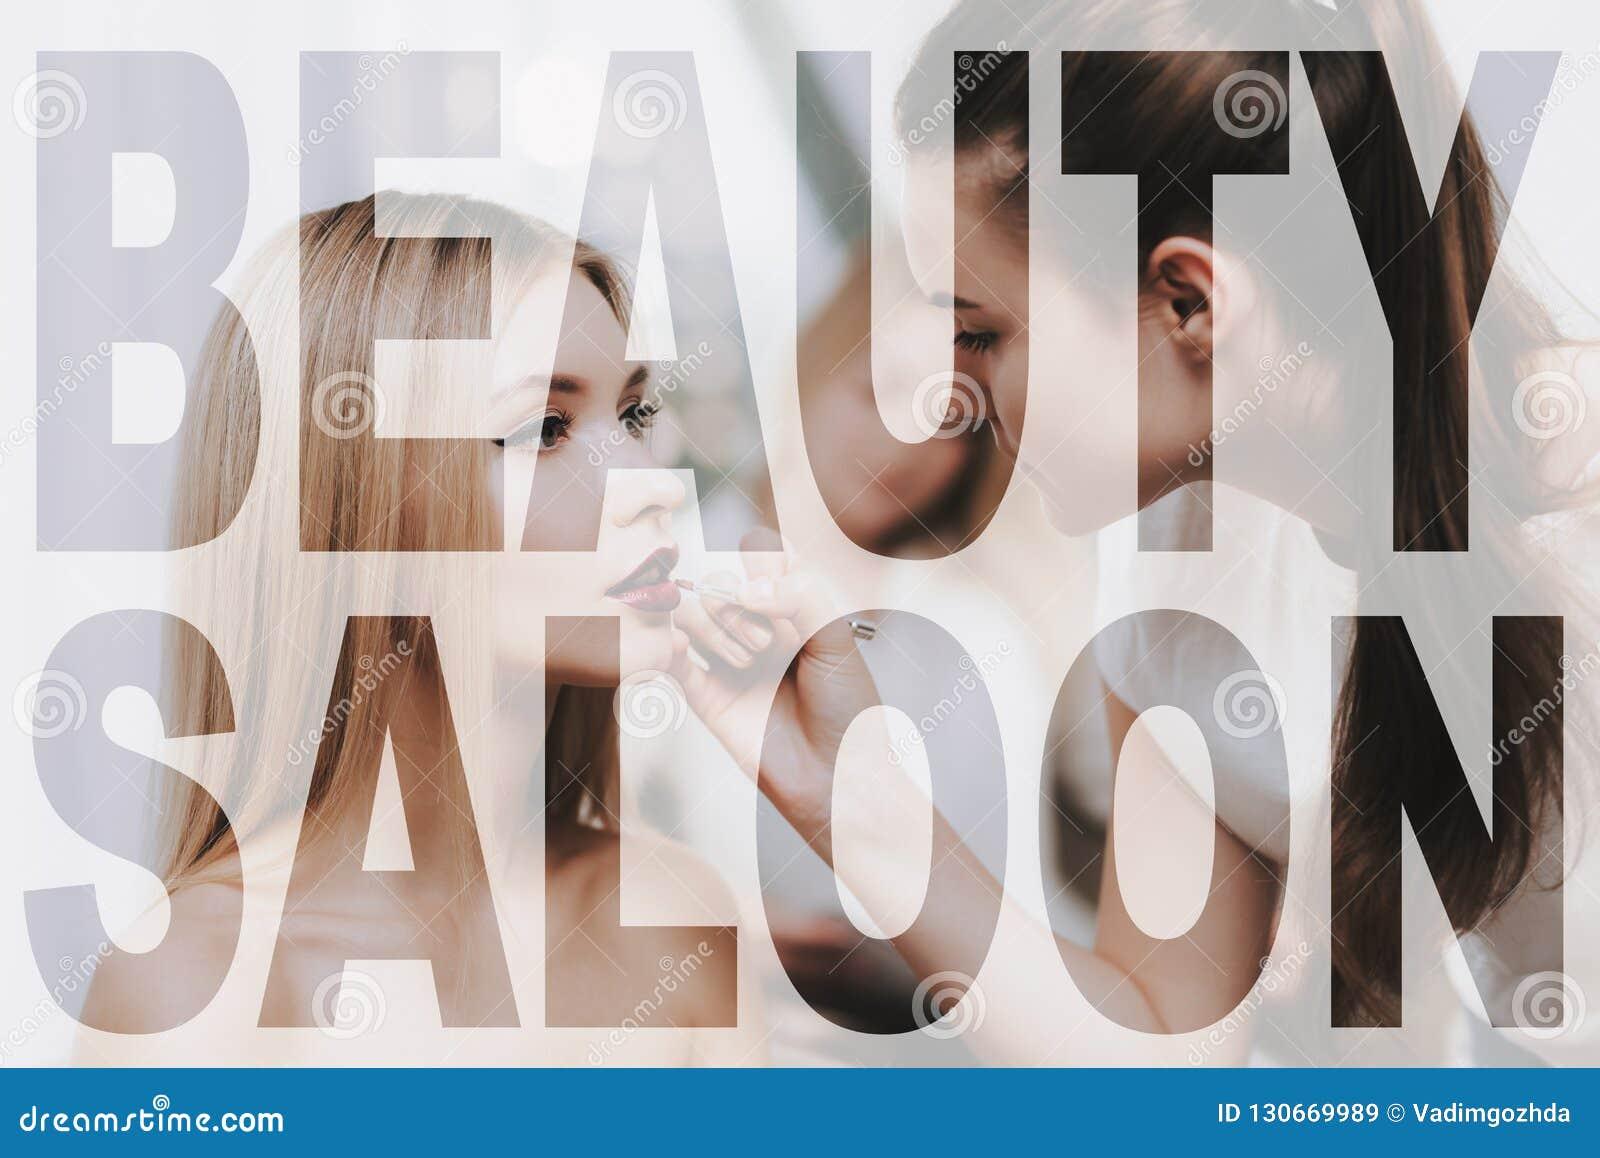 Artista de maquillaje Paints Lips de una mujer en salón